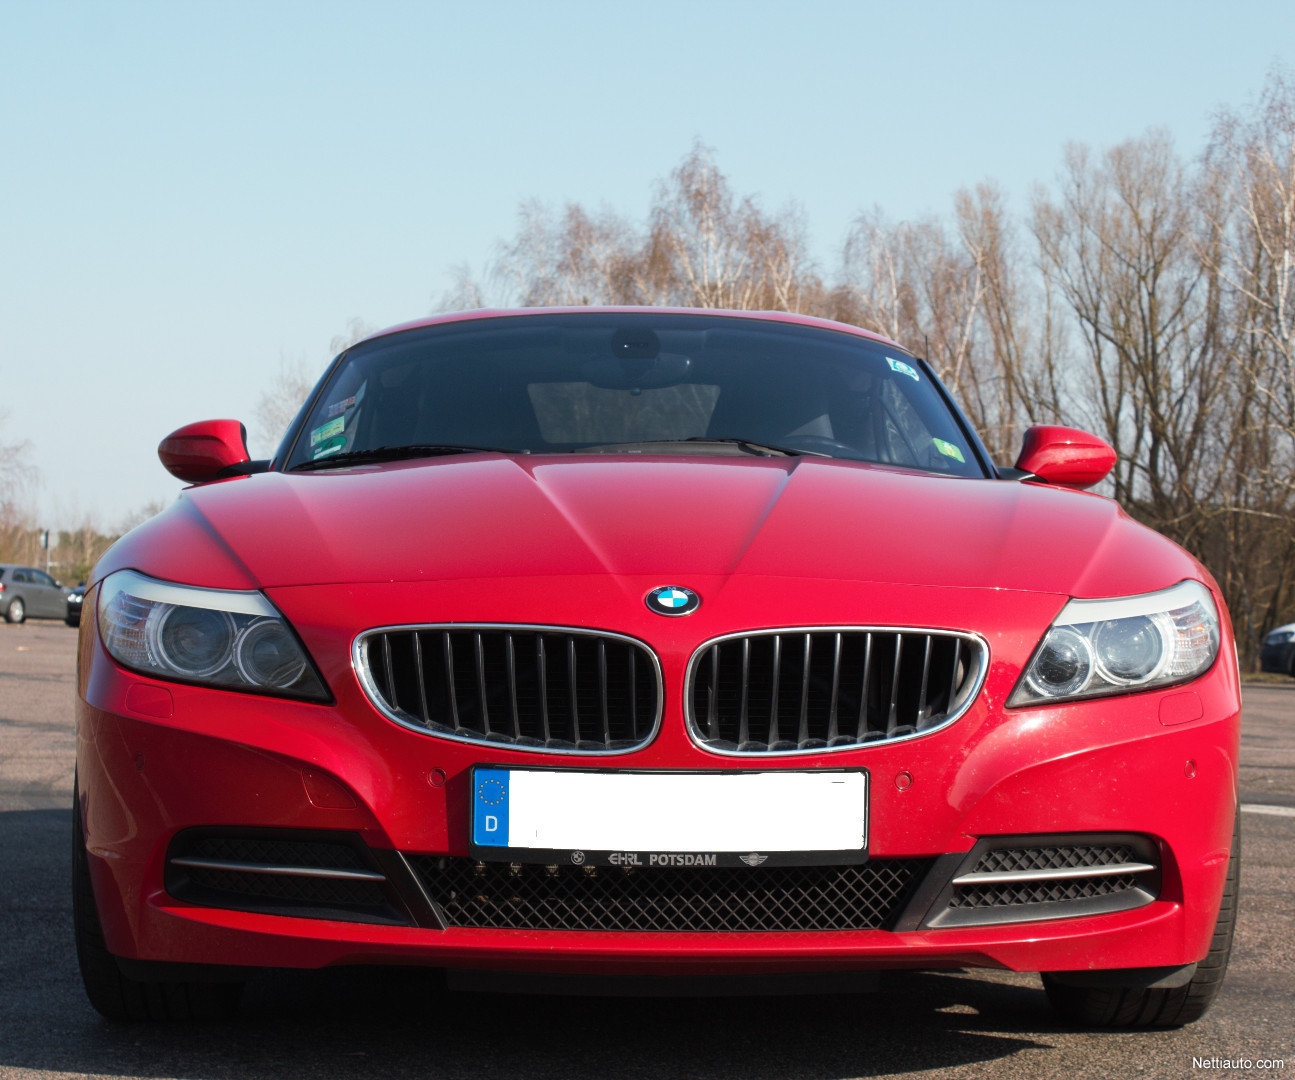 Bmw Z4 E86 Review: Lue Käyttäjien Autoarvostelut